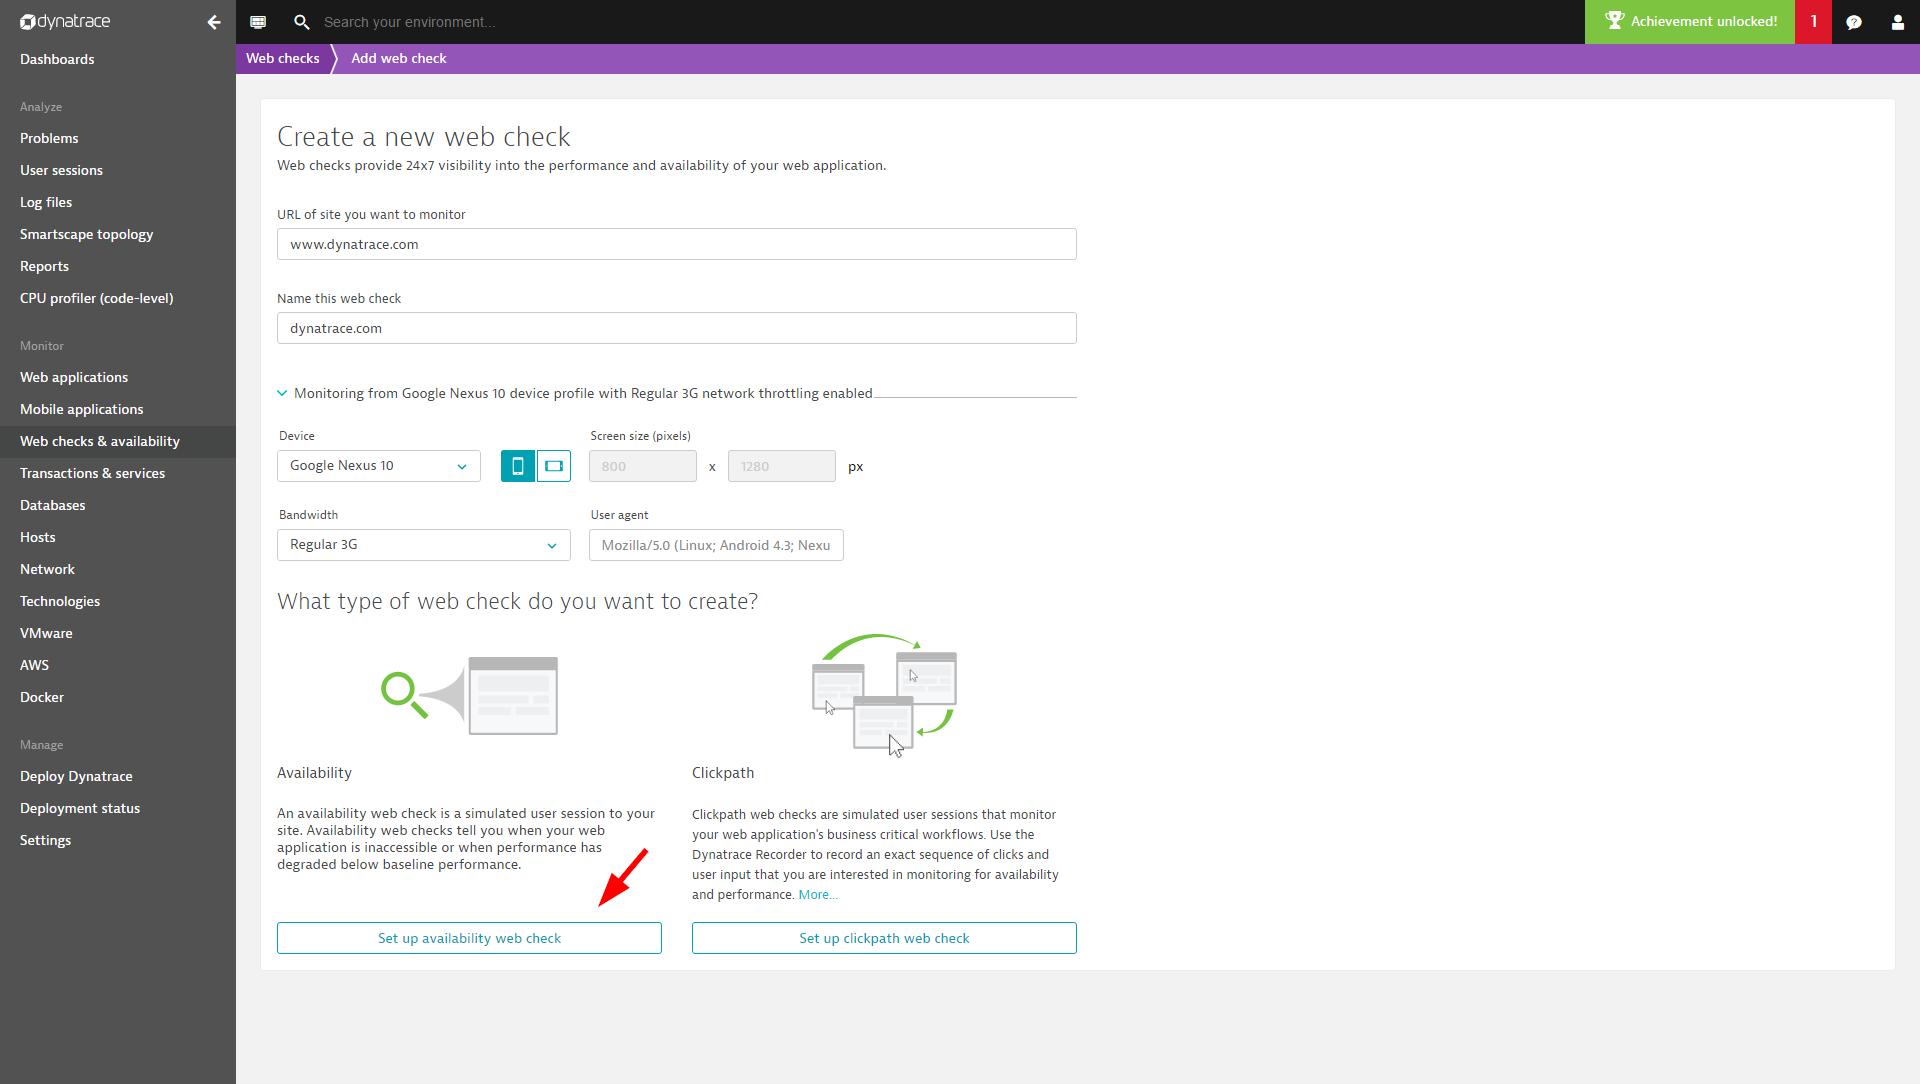 Create availiblity web check